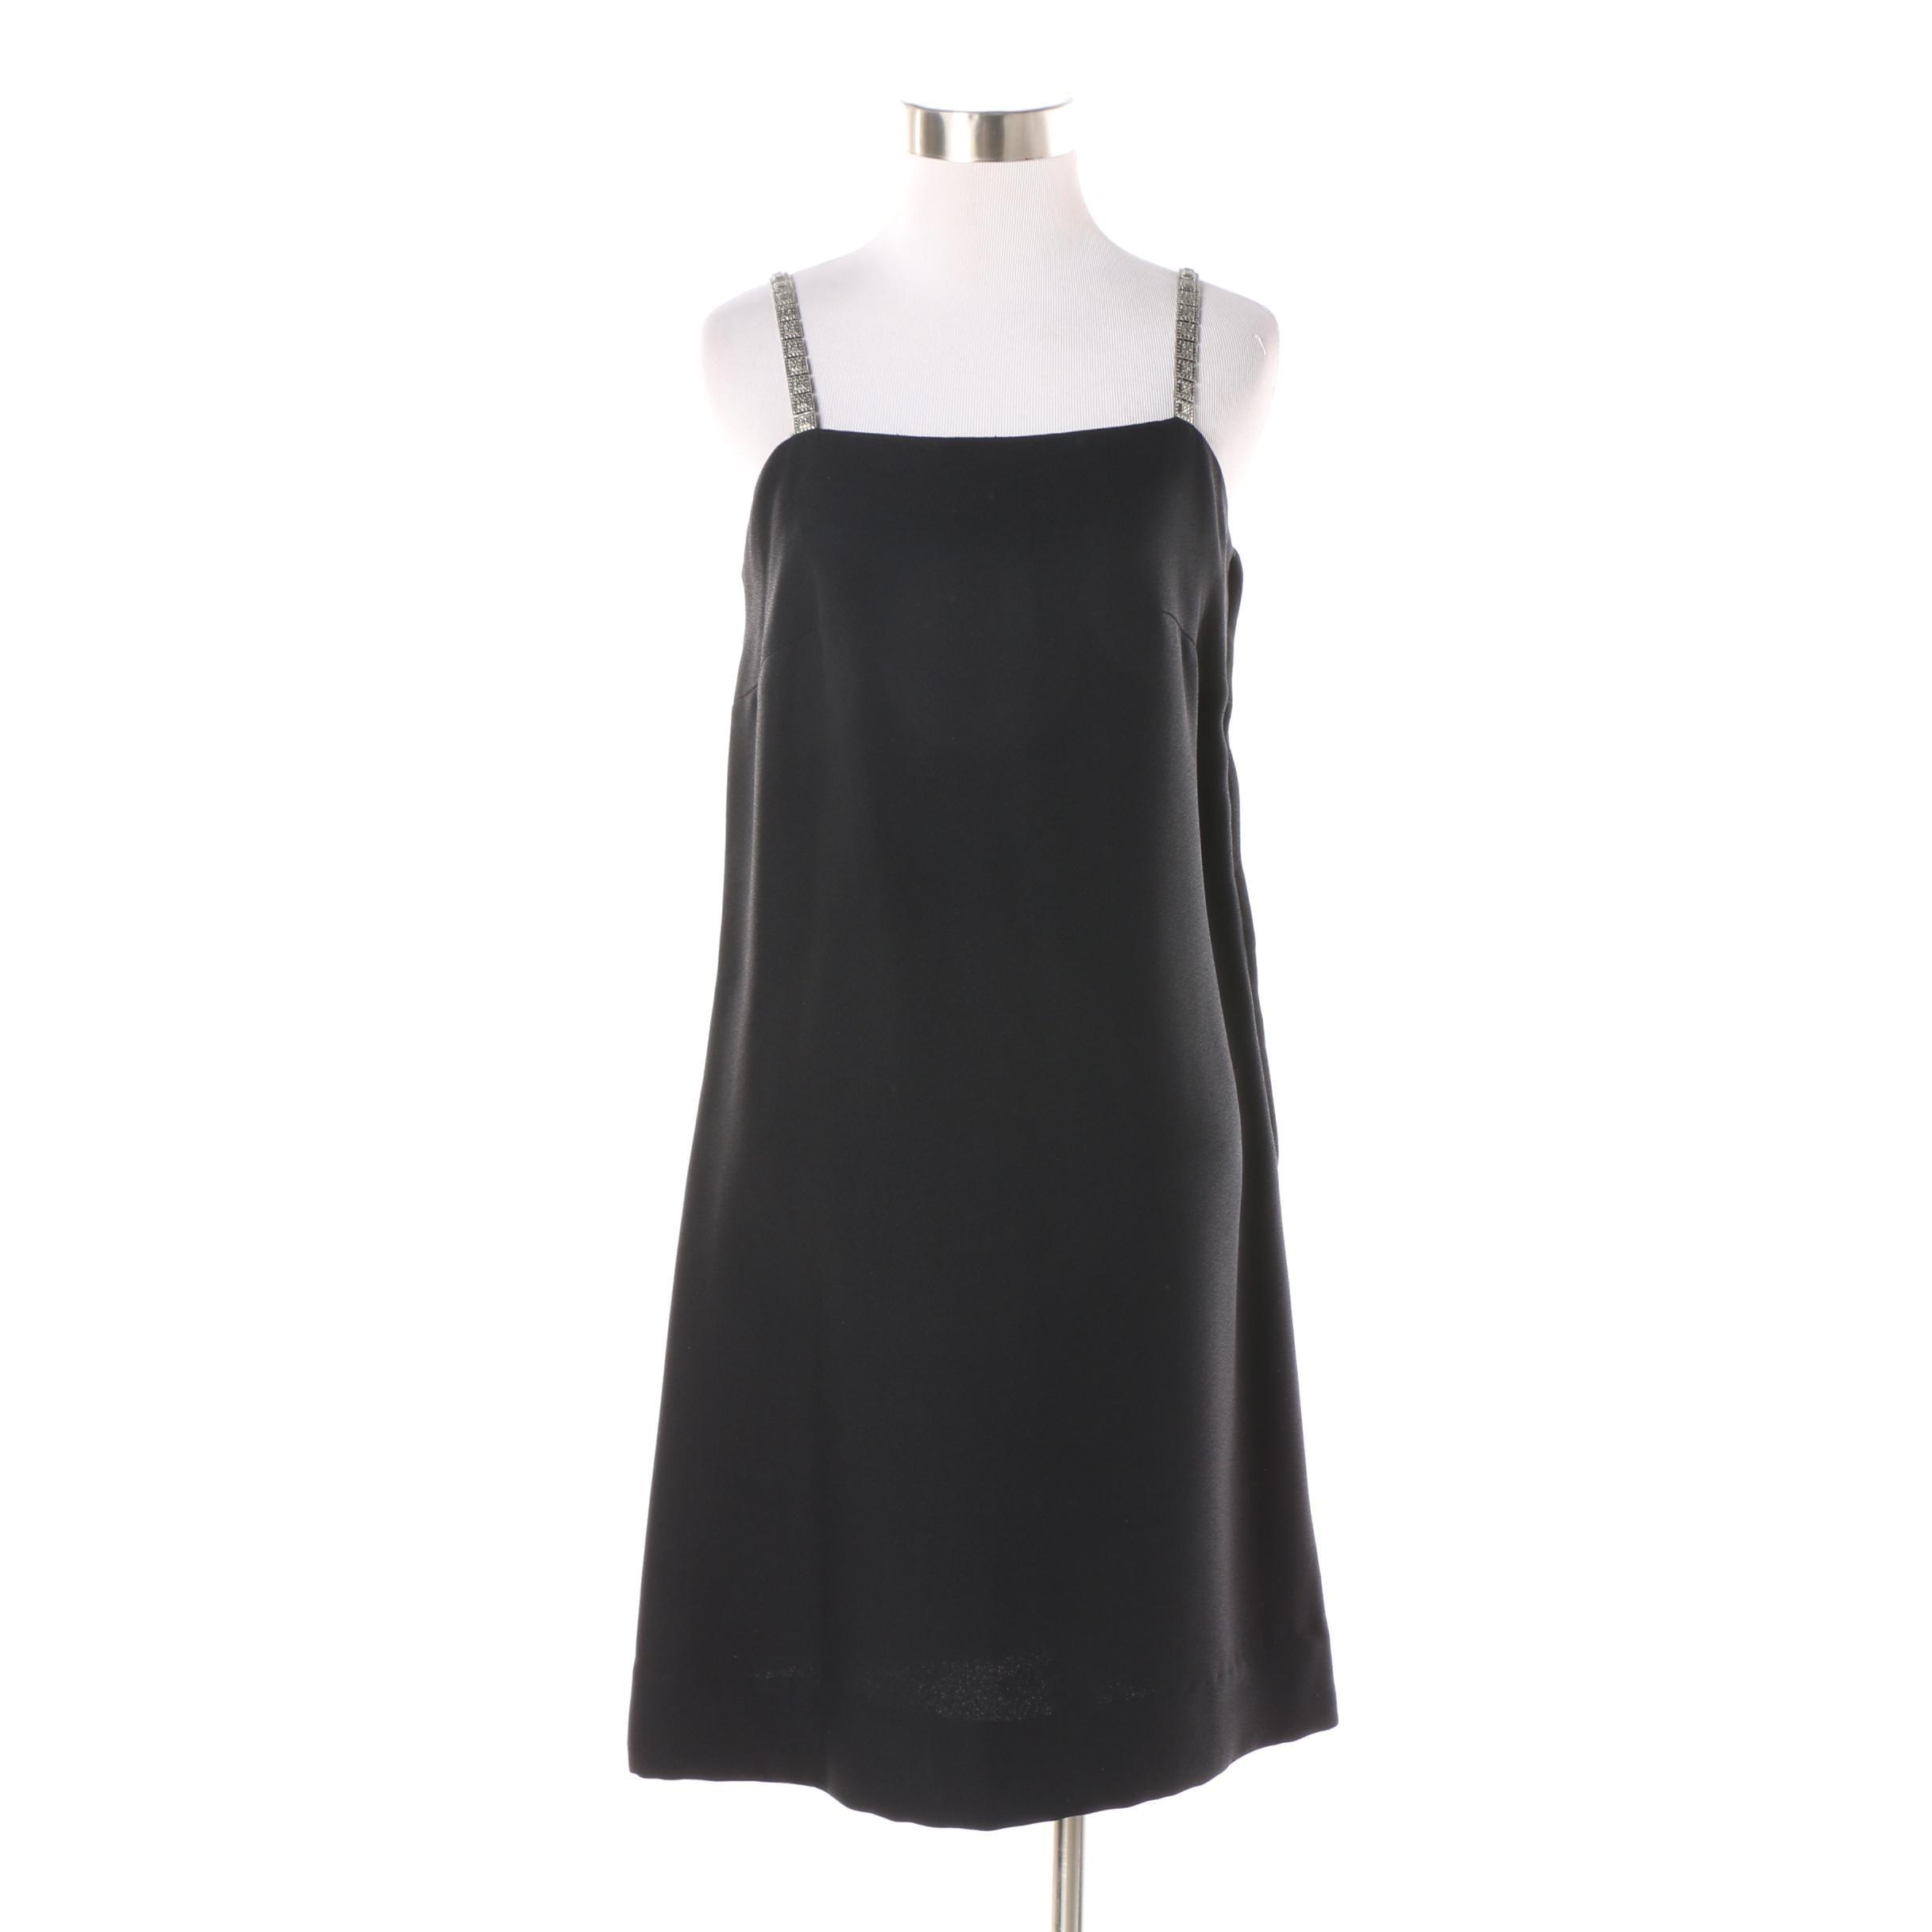 Circa 1960s Vintage Felix Safian Black Cocktail Dress w/ Marcasite Style Straps